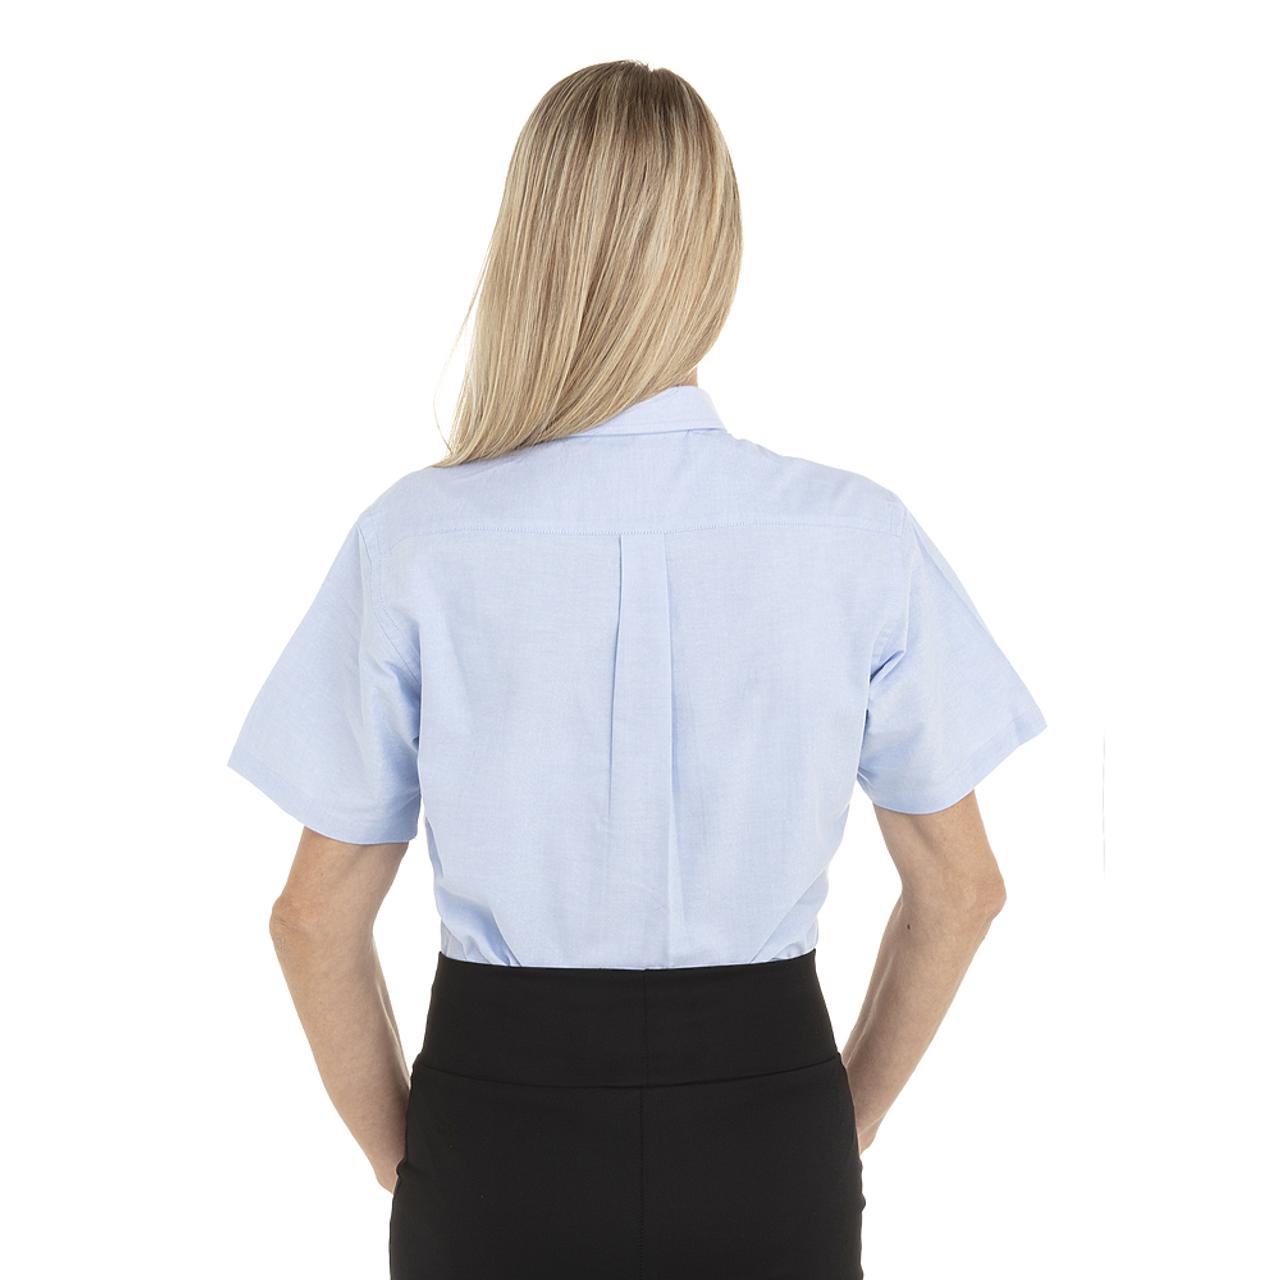 Blue - Back, 18CV301 Van Heusen Ladies' Short Sleeve Oxford Shirt -T-shirt.ca